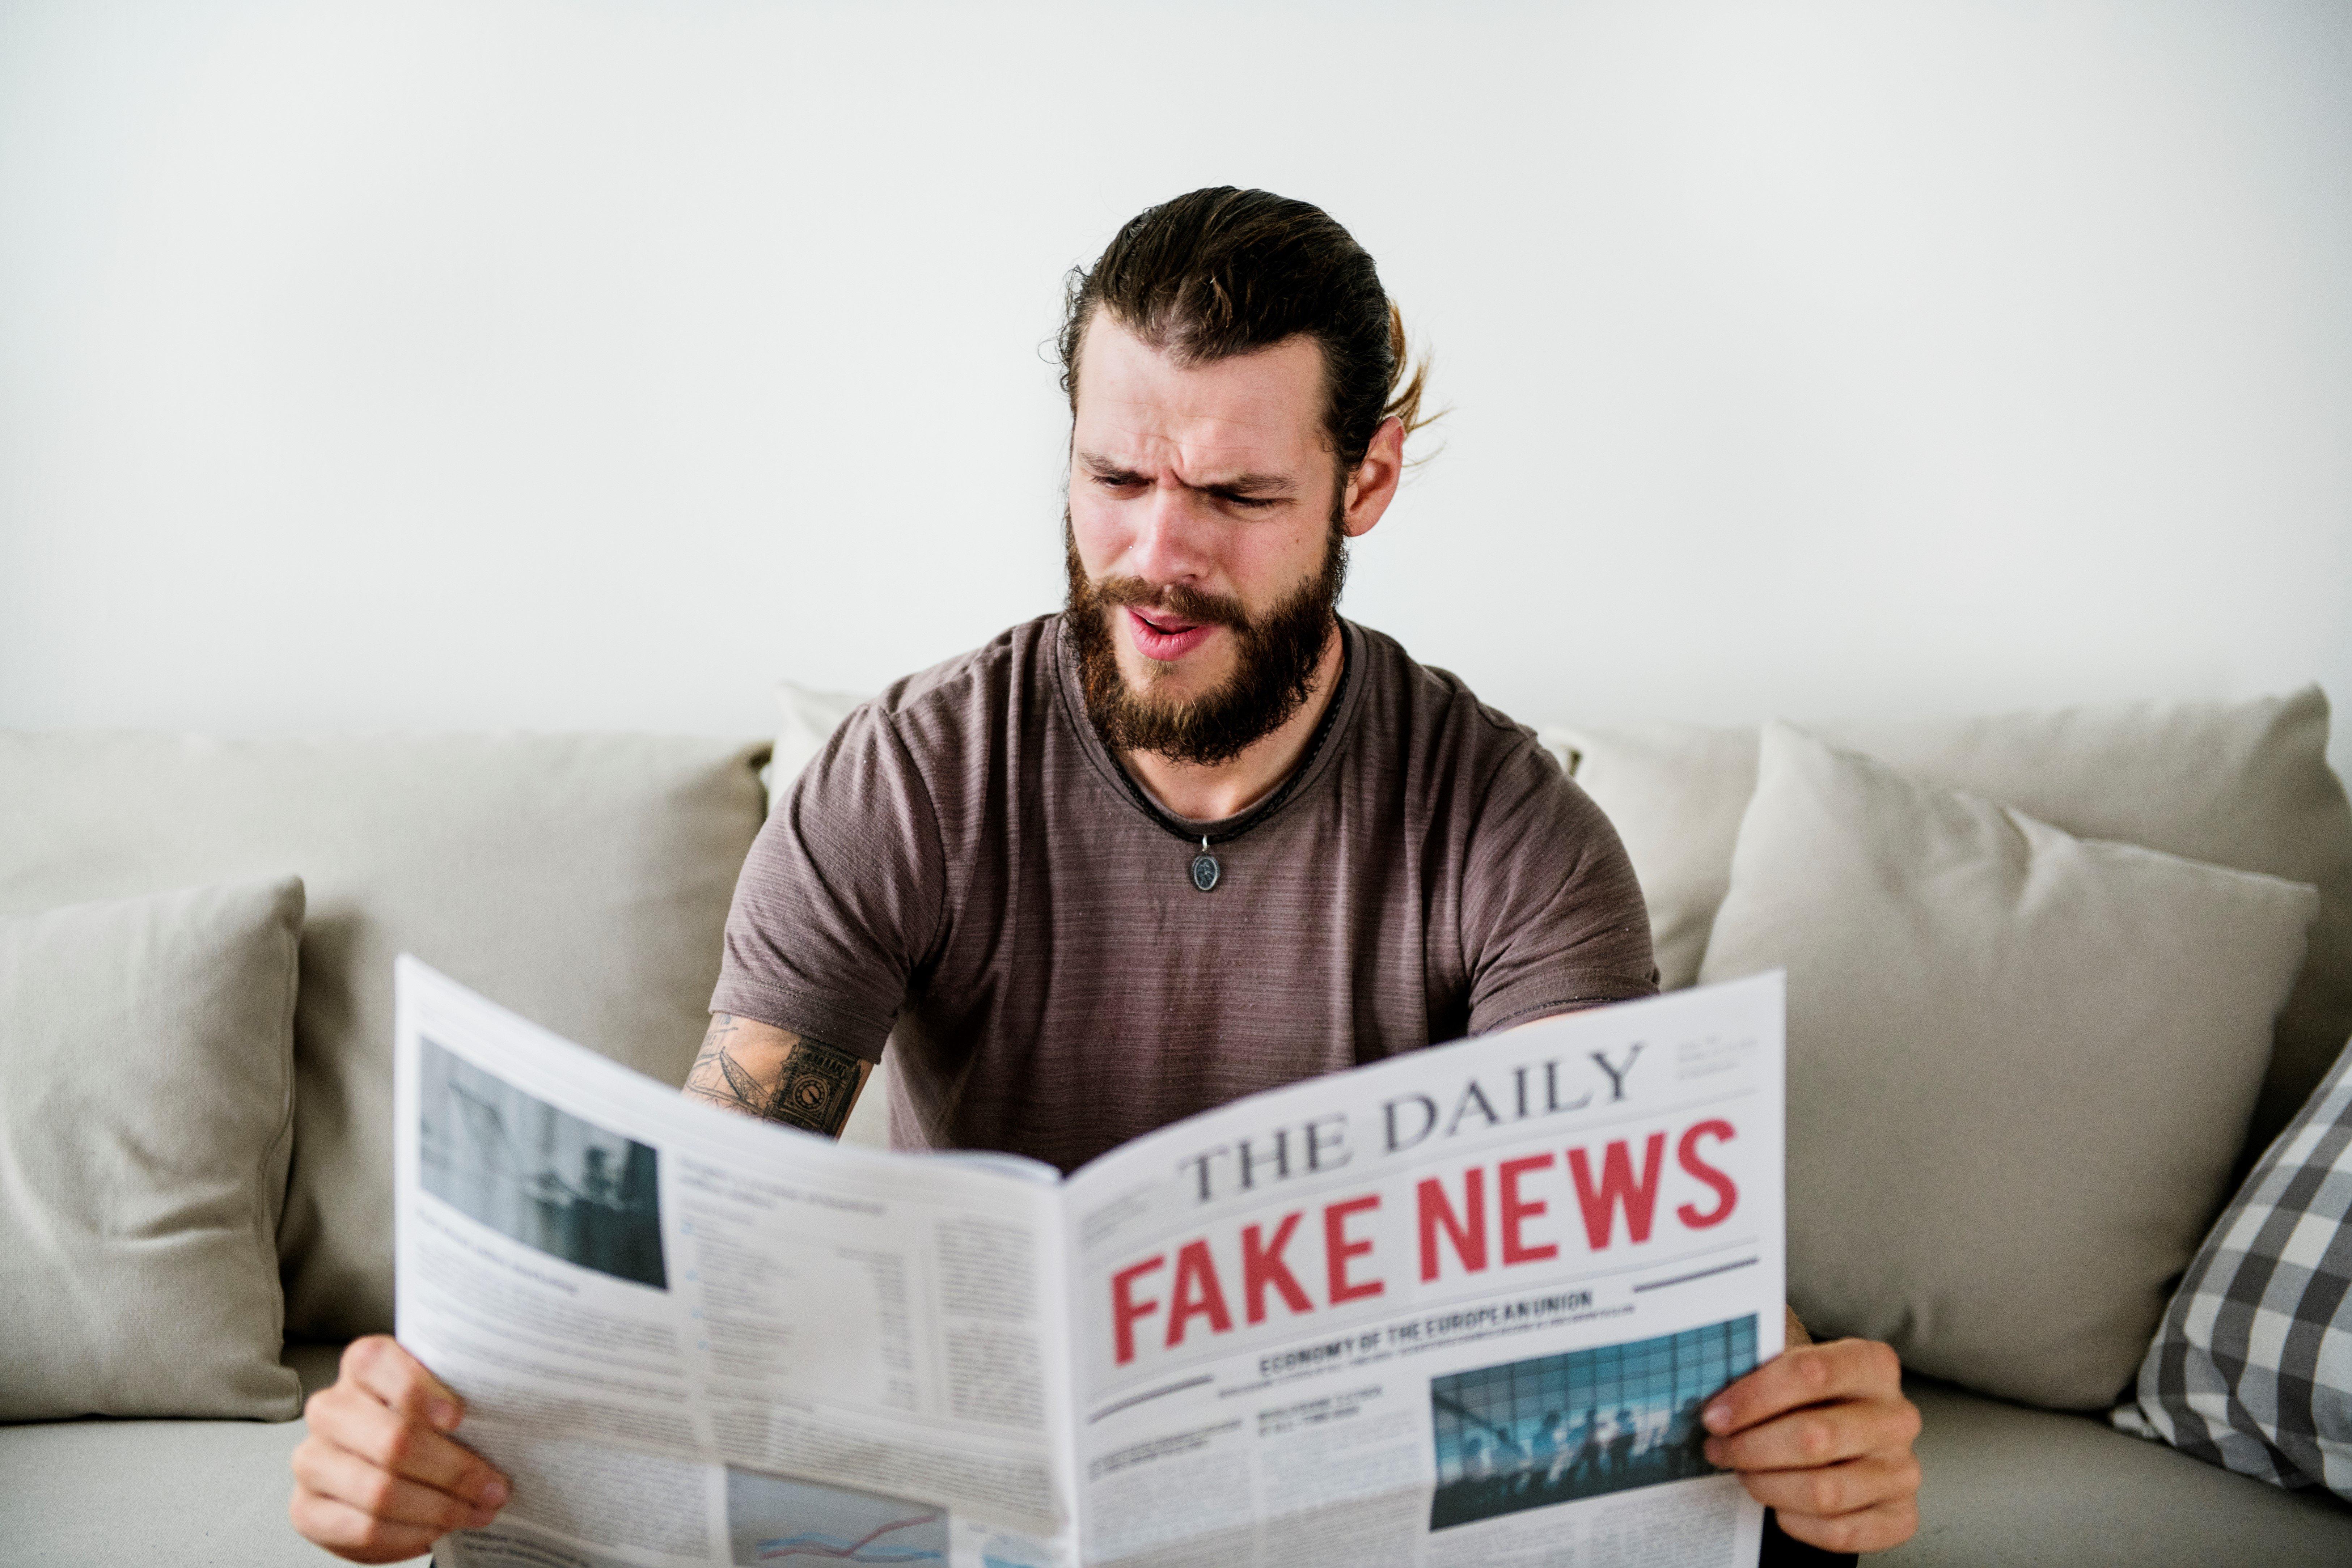 fake-news-headline-on-a-newspaper-PDTG7PC